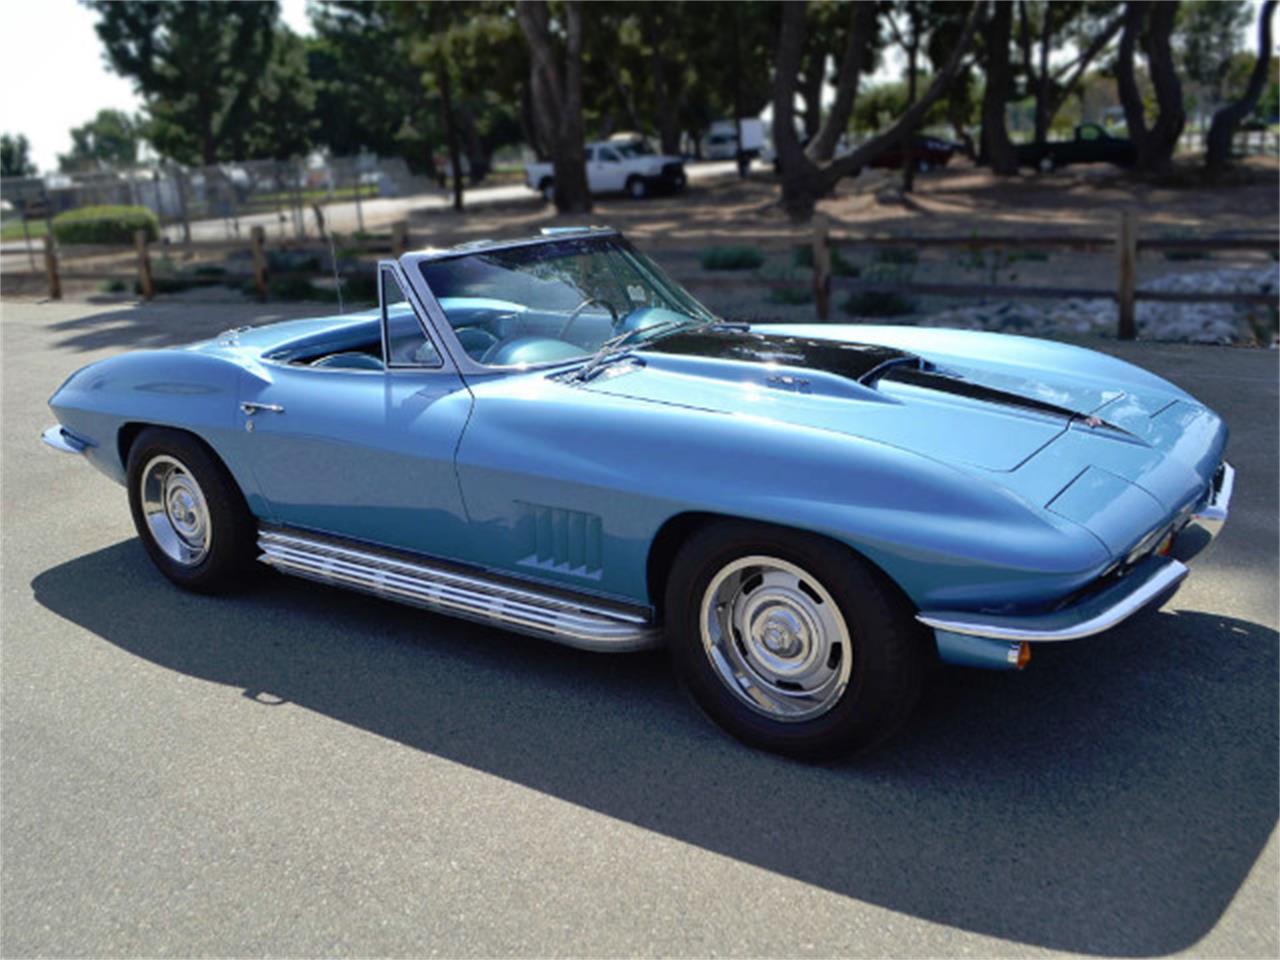 Large Picture of Classic '67 Chevrolet Corvette located in California - MQNE